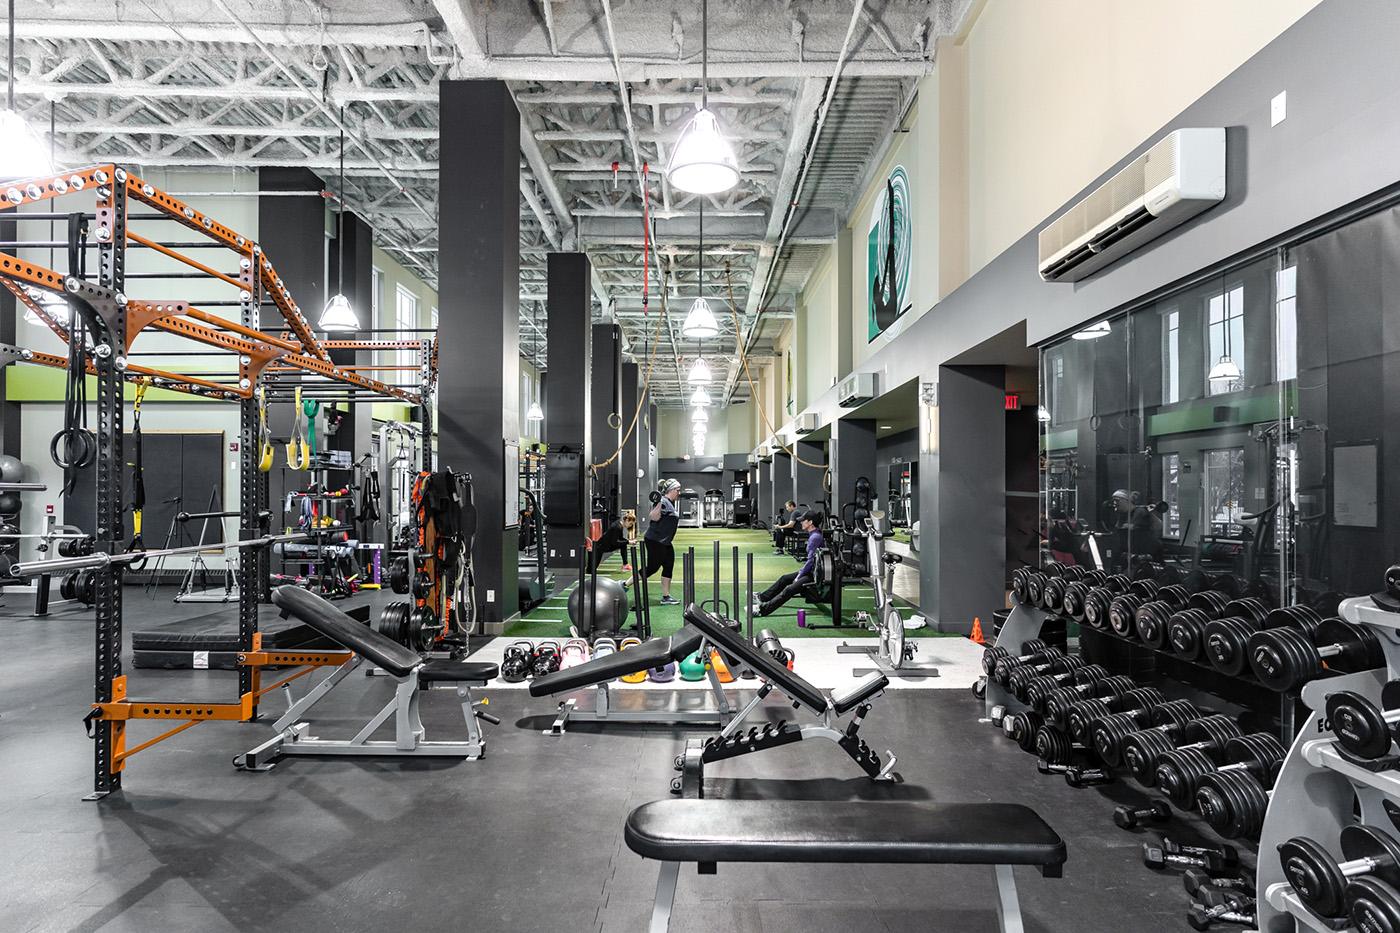 cityfit-gym-personal-training-calgary-workout-facility-inglewood-16.jpg